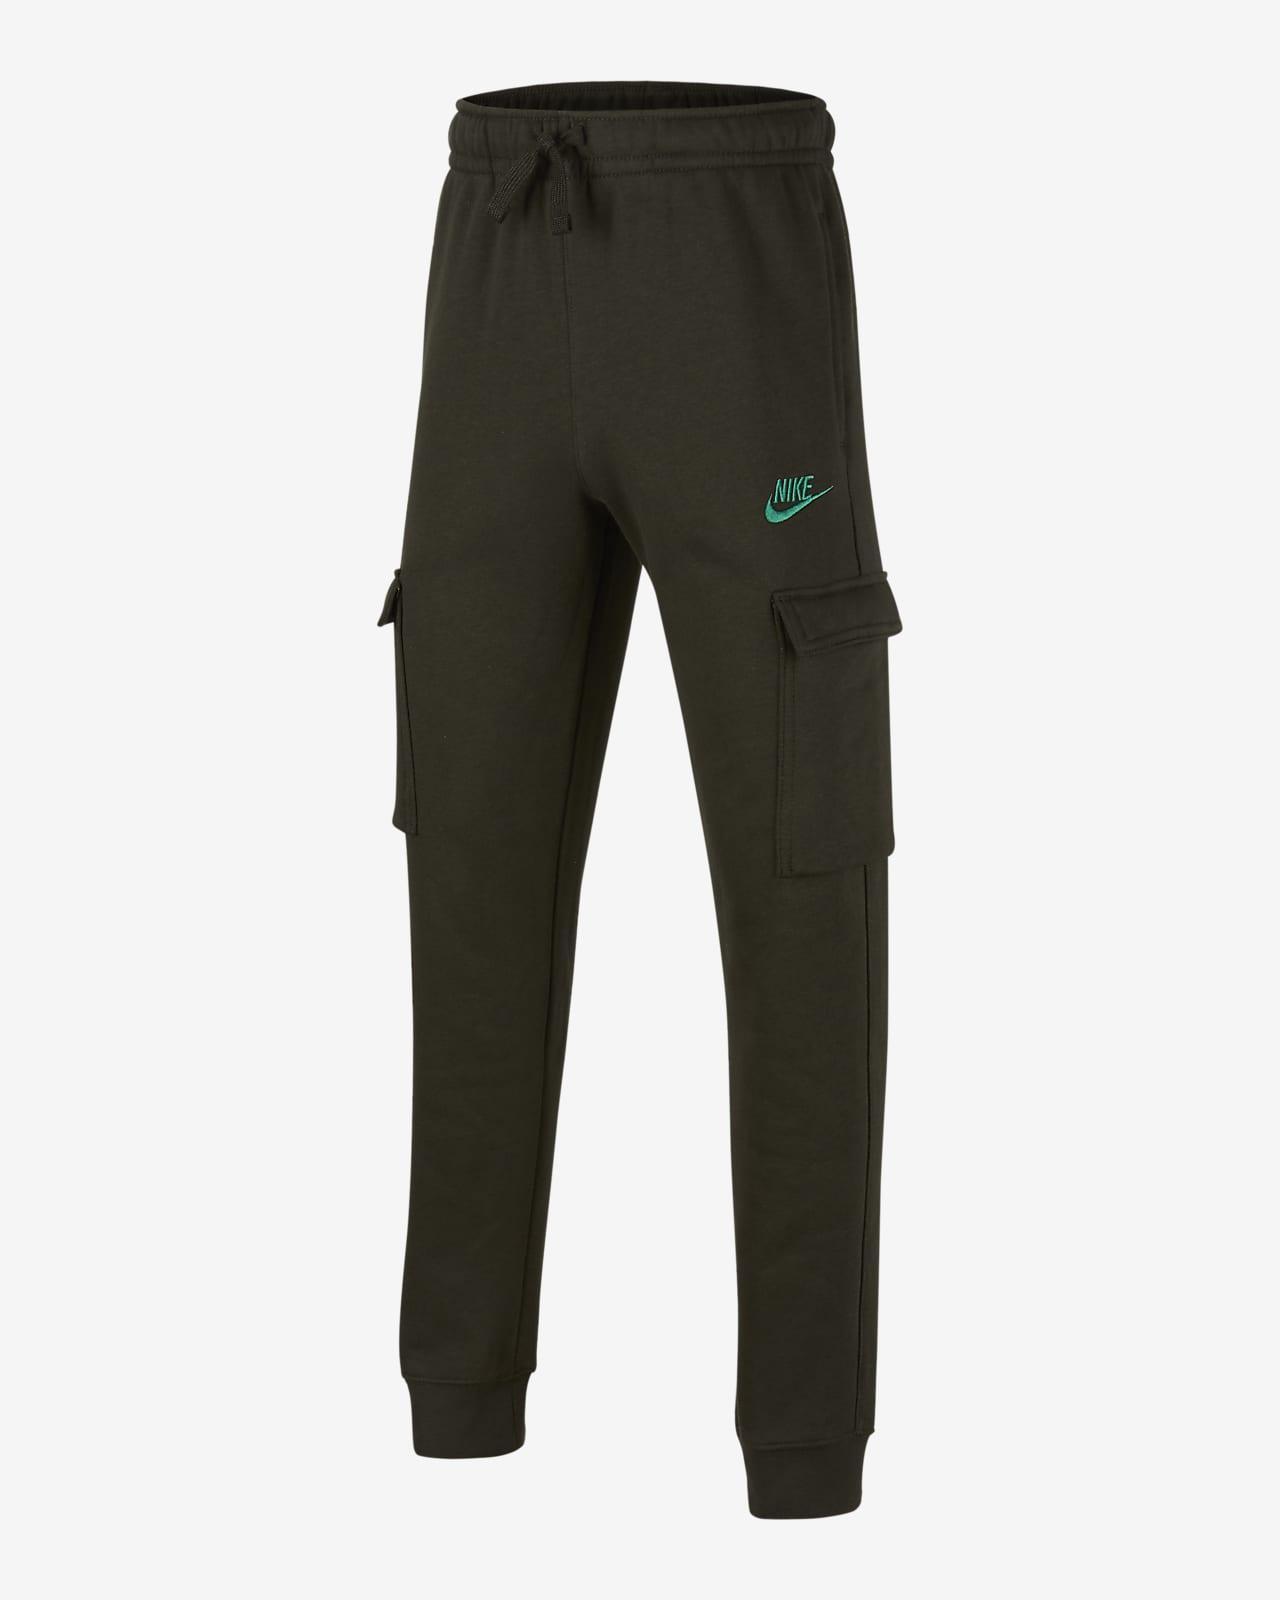 Nike Sportswear Club 大童(男孩)工装长裤